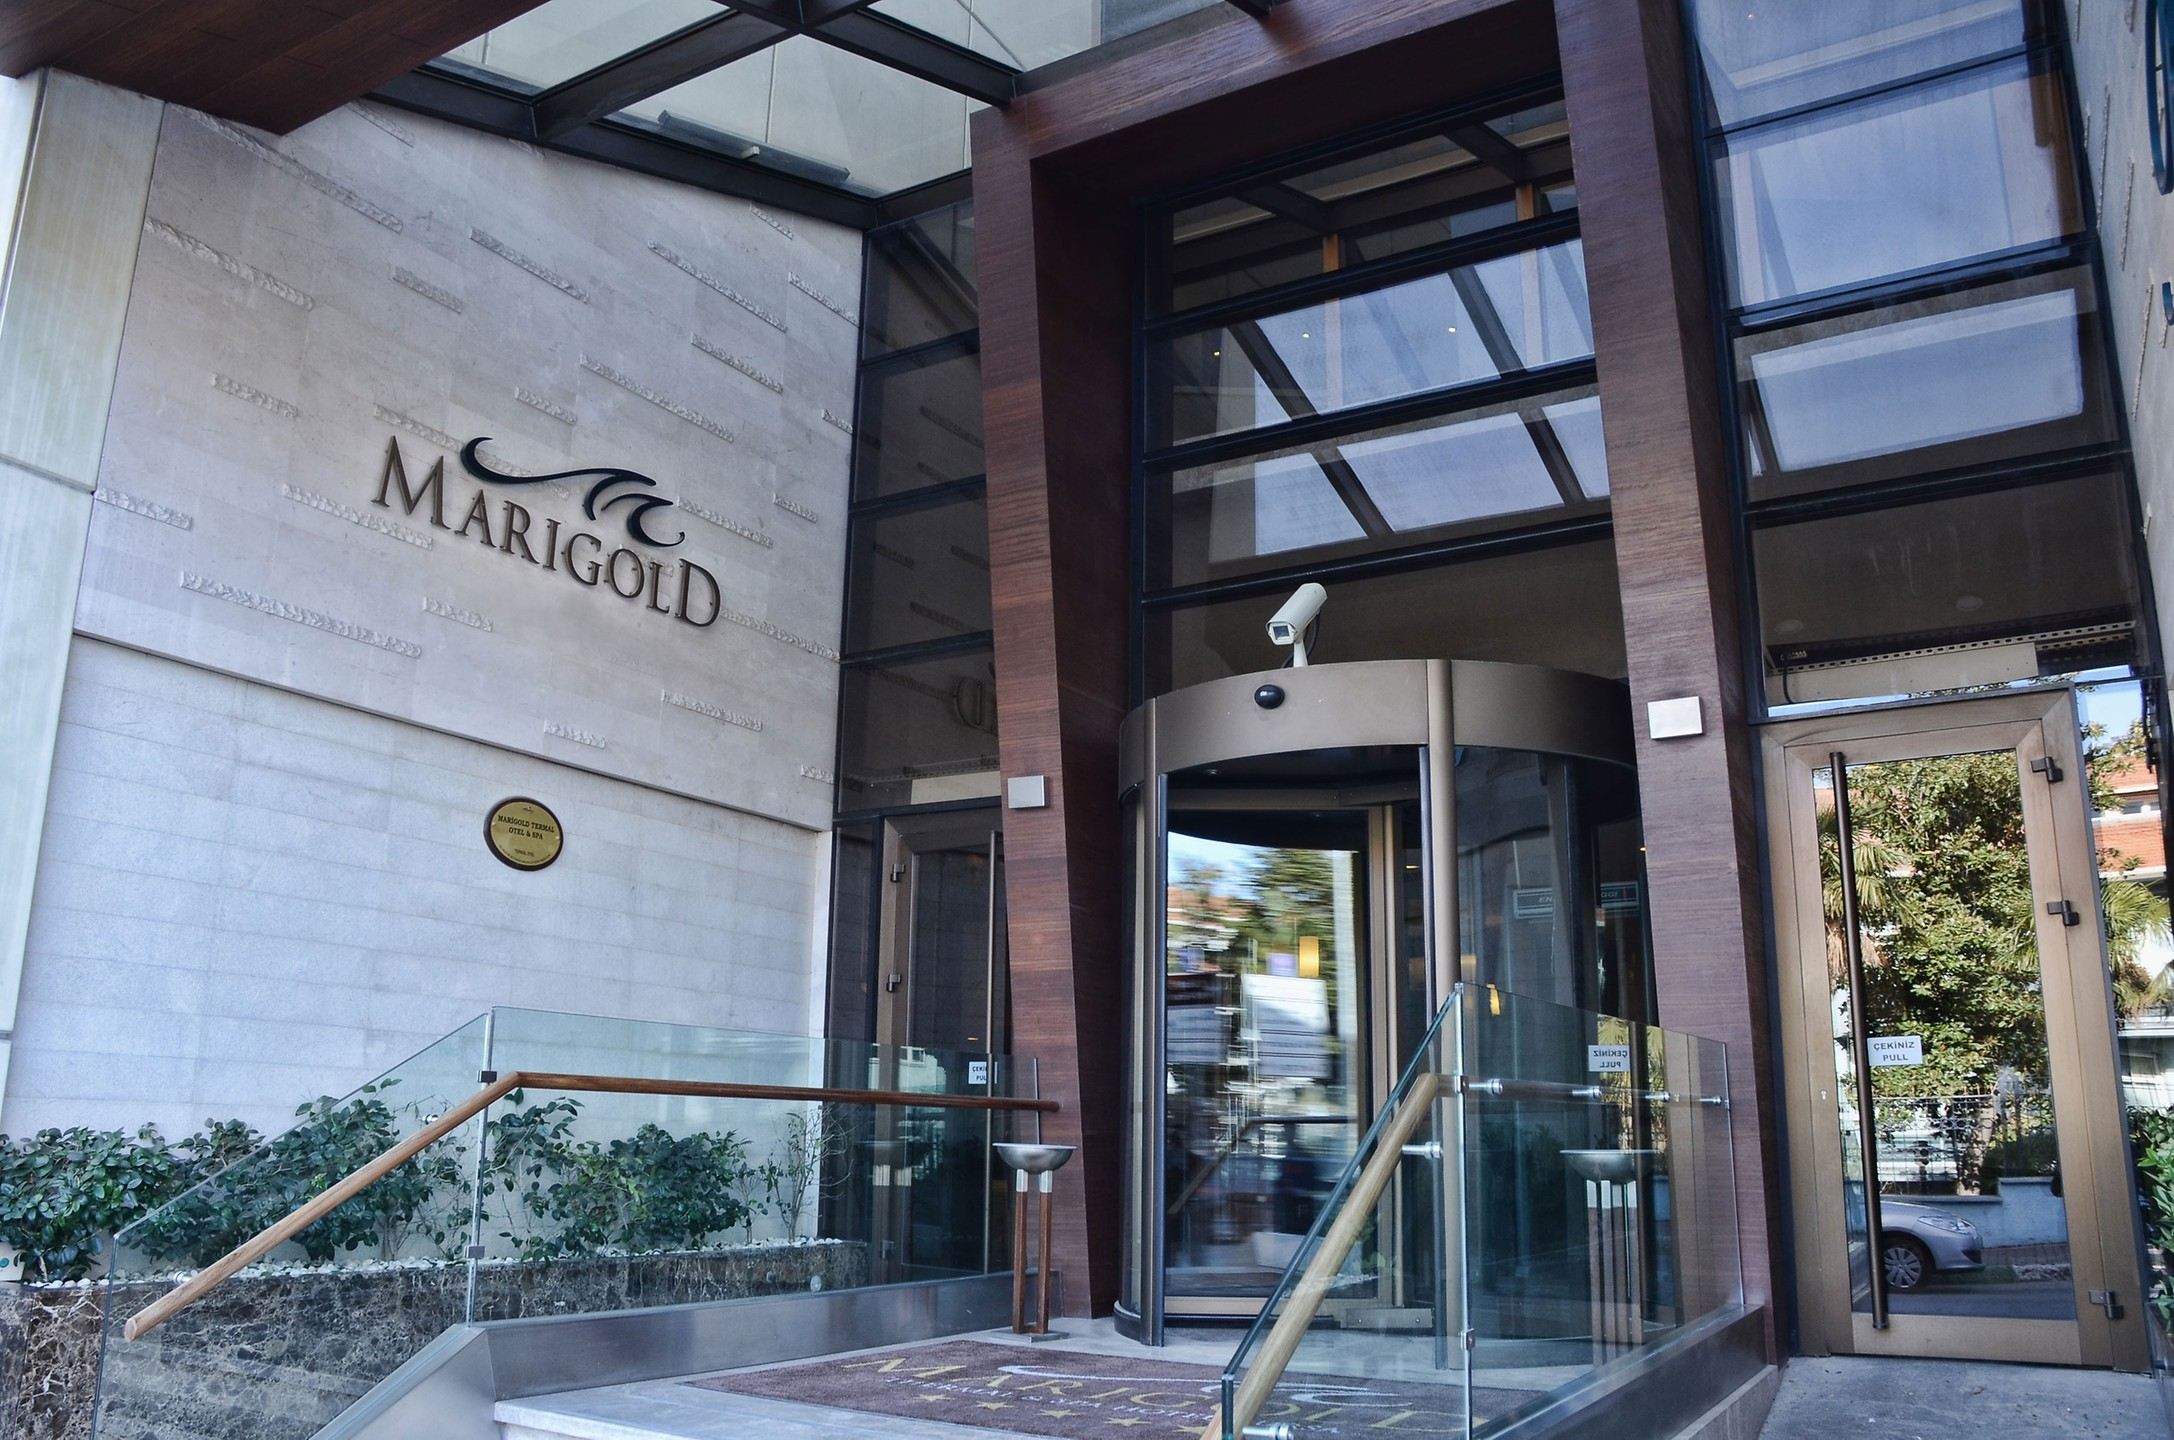 Marigold Thermal Hotel